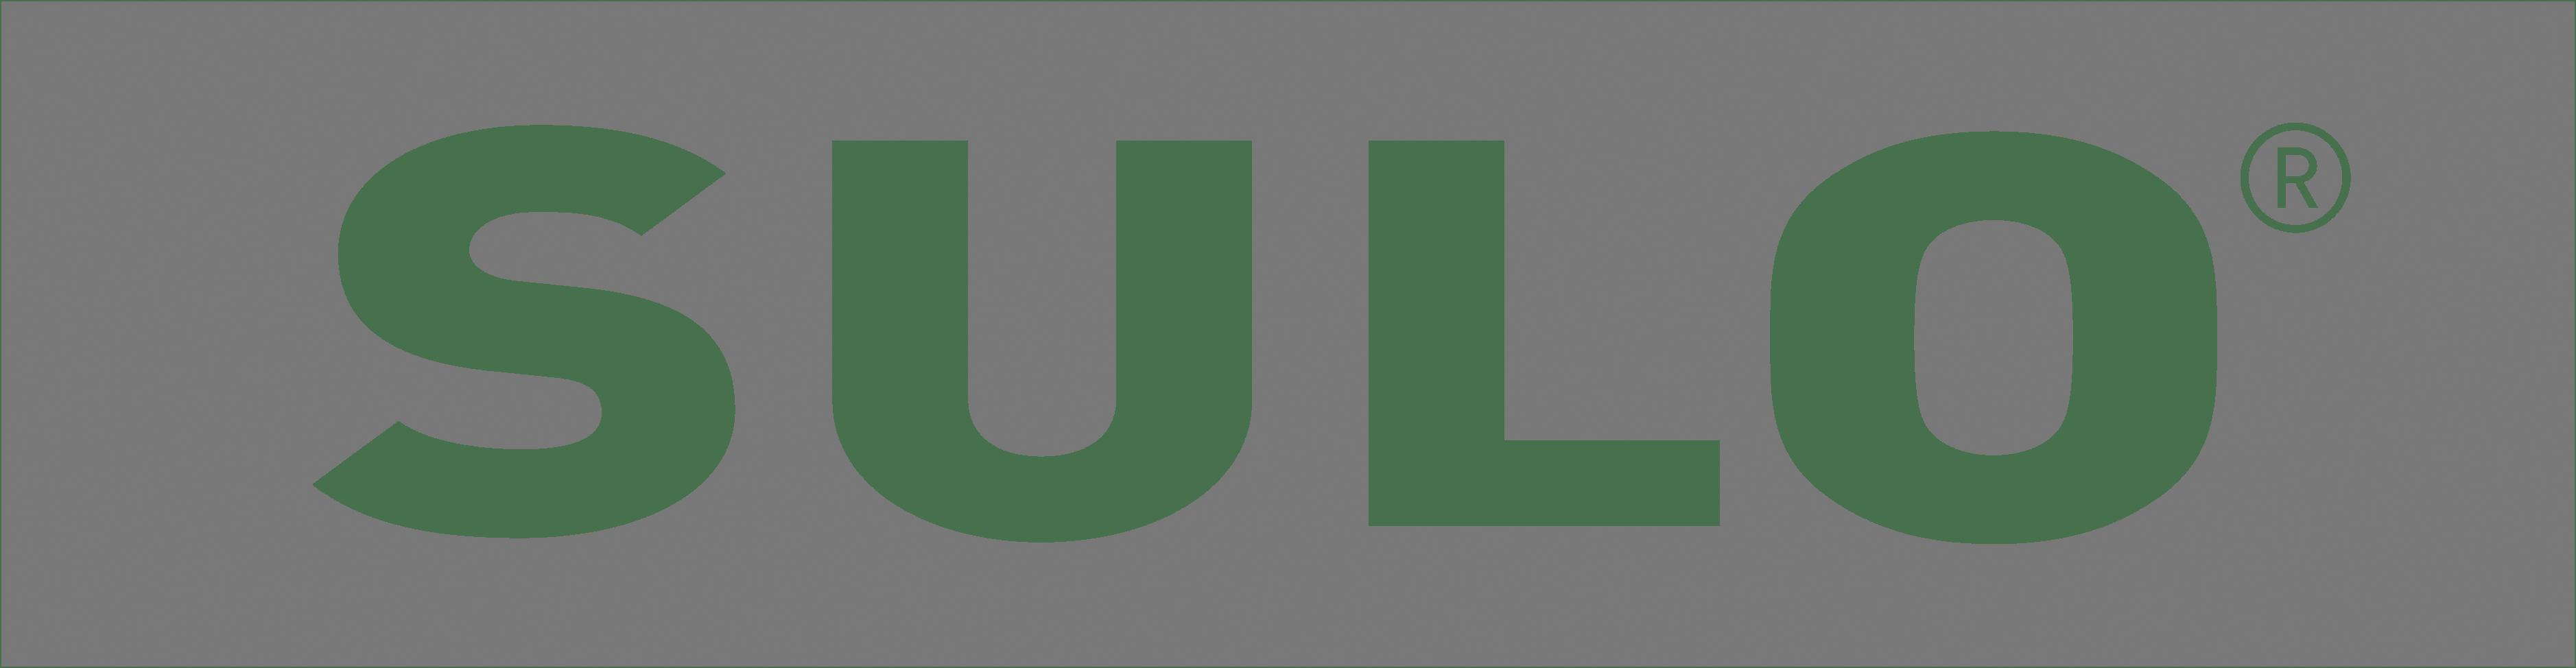 logo_grey.jpg